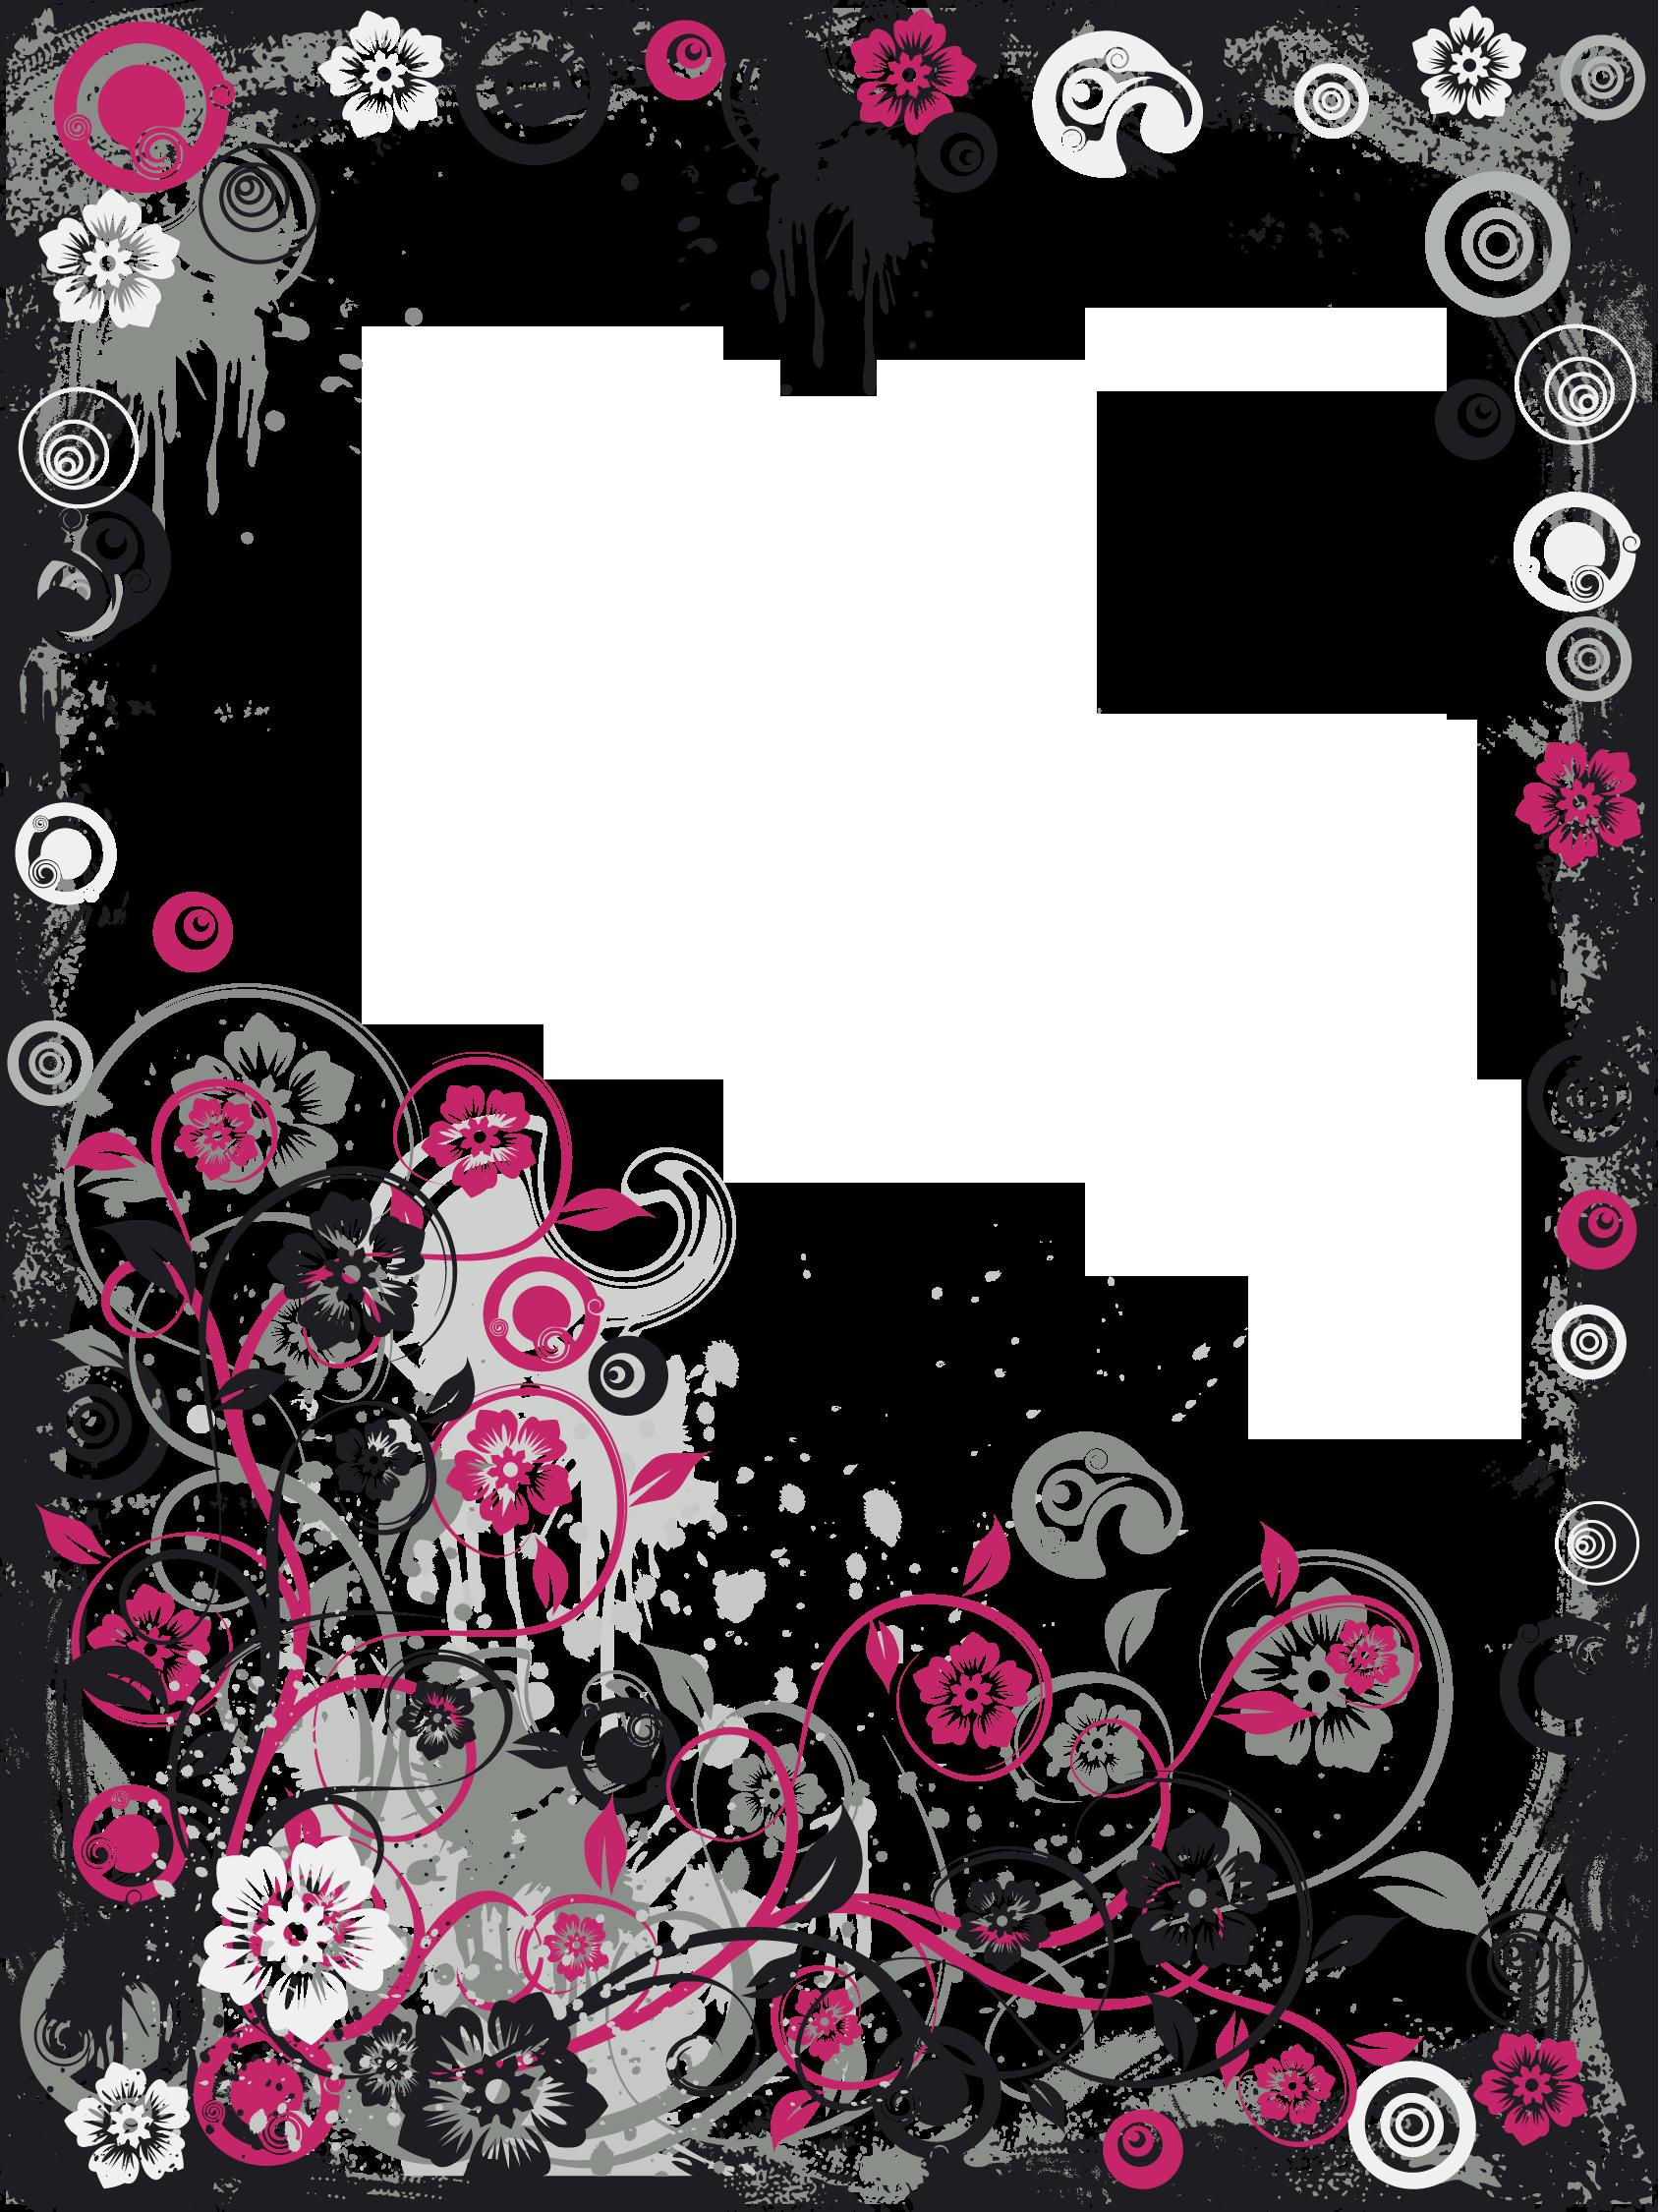 Modern black frame clipart picture transparent library Black and Pink Modern Transparent Frame   Png   Frame ... picture transparent library